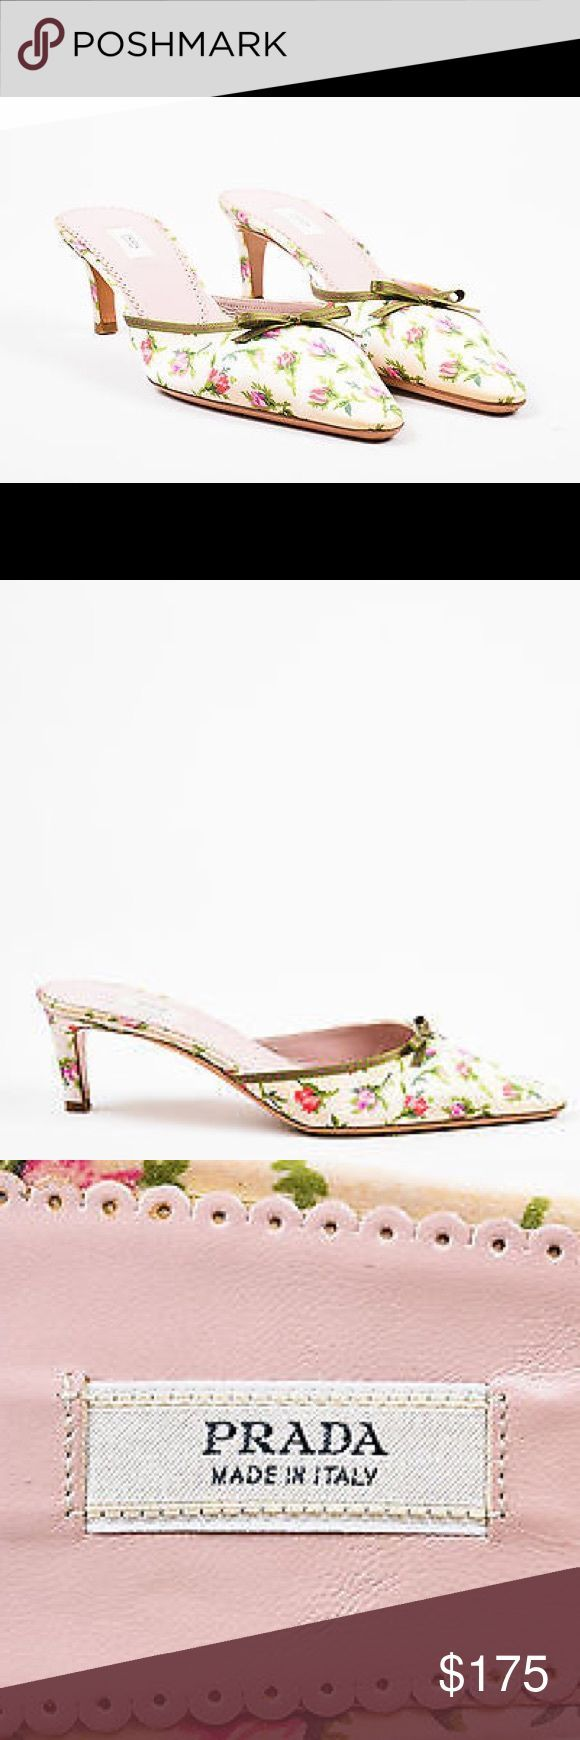 Prada Kitten Heels – geblümte EUC Prada Heels in einem bezaubernden Rosa, Grün …  – Adorable Kittens